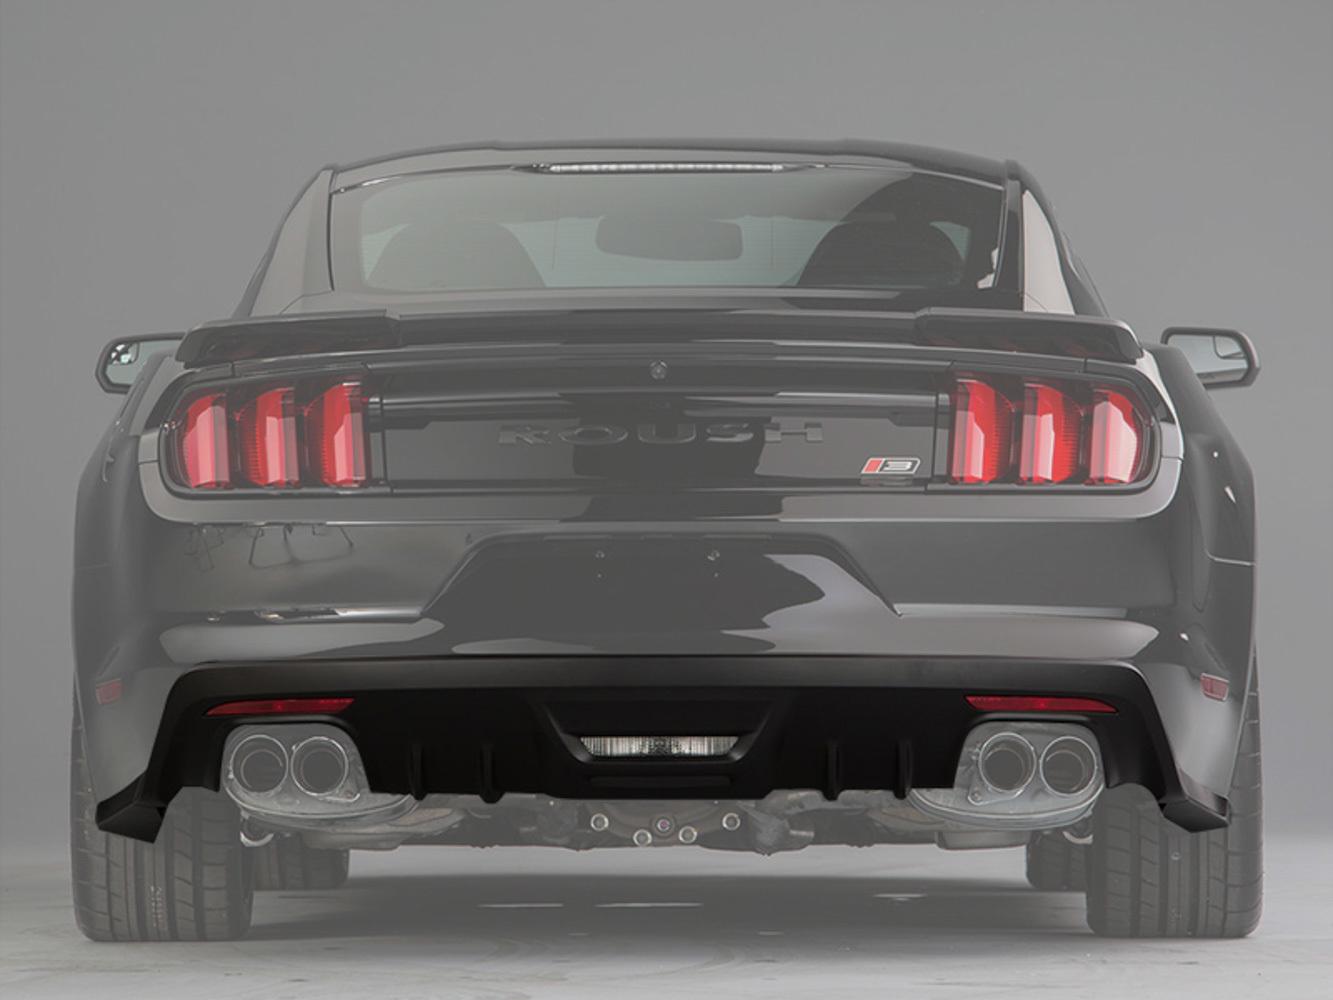 Roush Performance Parts Rear Fascia Valance 15- Up Mustang - Roush